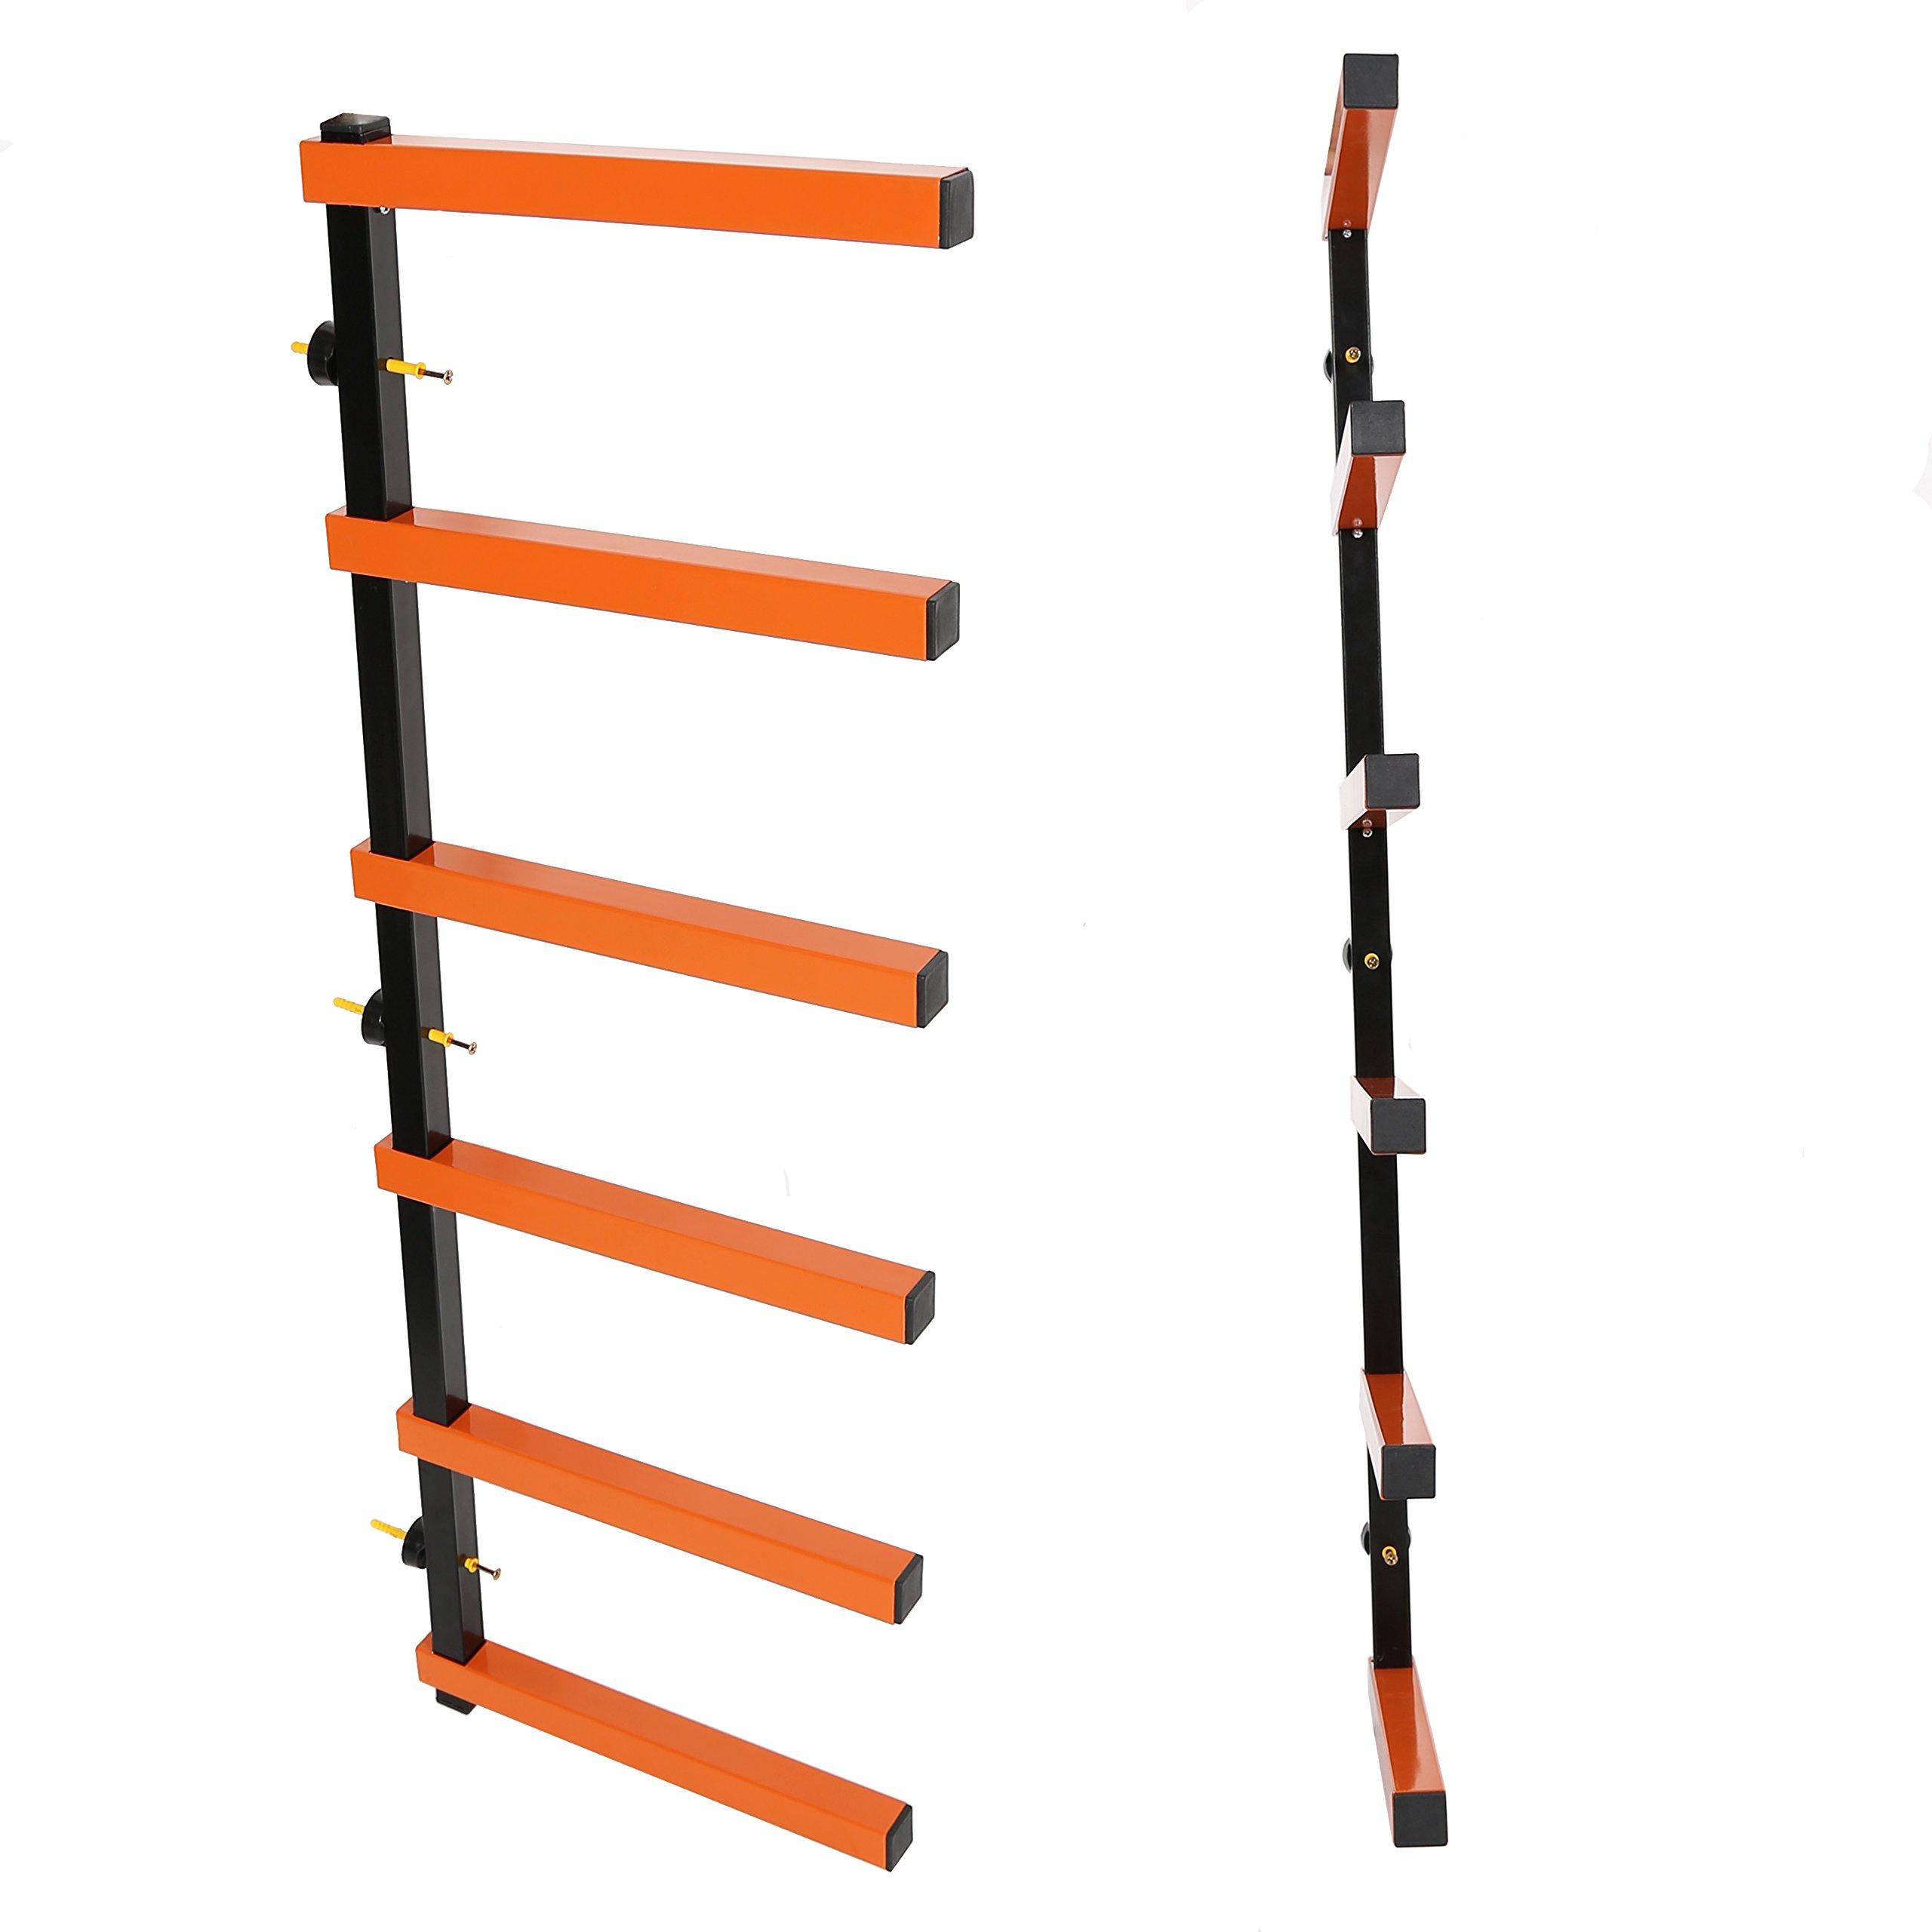 7BLACKSMITHS Six-Level 600 lb Capacity Lumber Storage Rack Wall-Mounted both Indoor and Outdoor Use Wood Organizer Rack by 7BLACKSMITHS (Image #5)